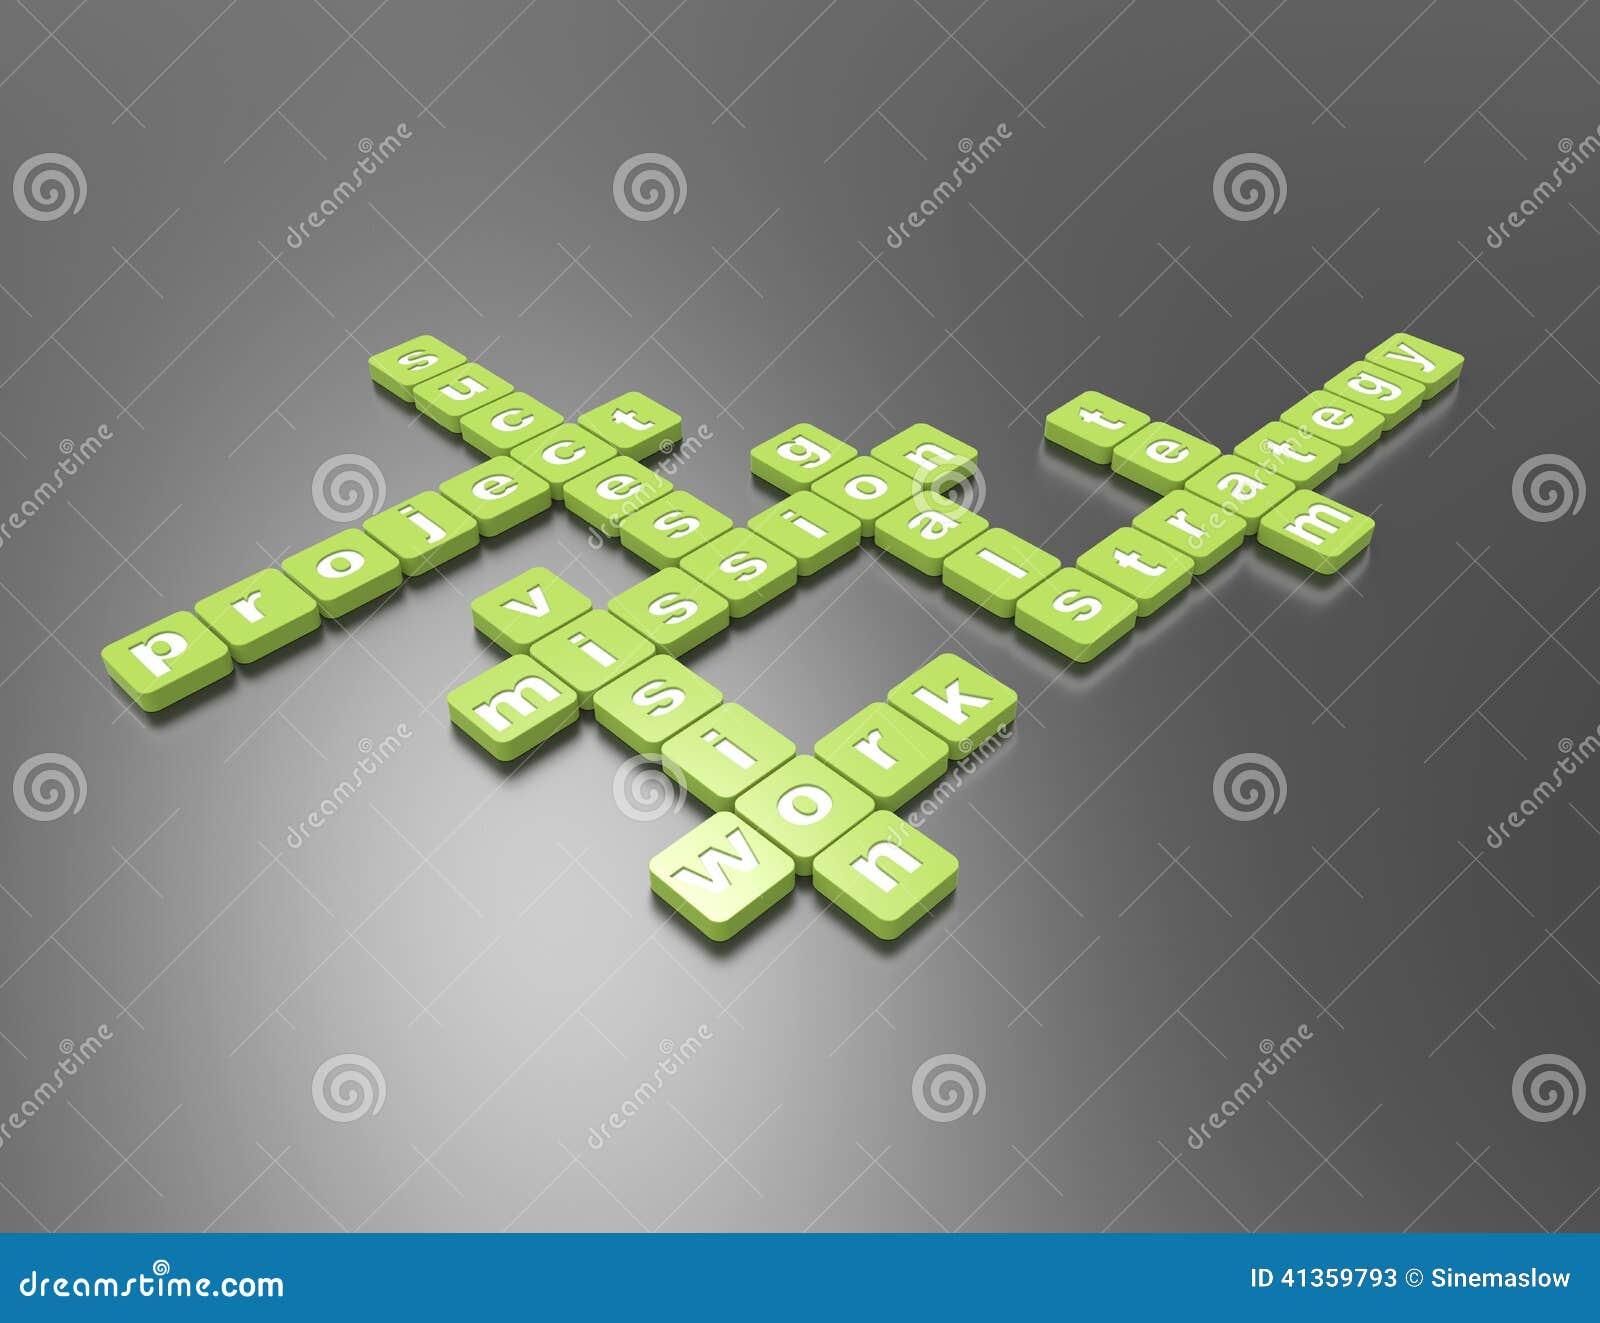 Auftrag Kreuzworträtsel